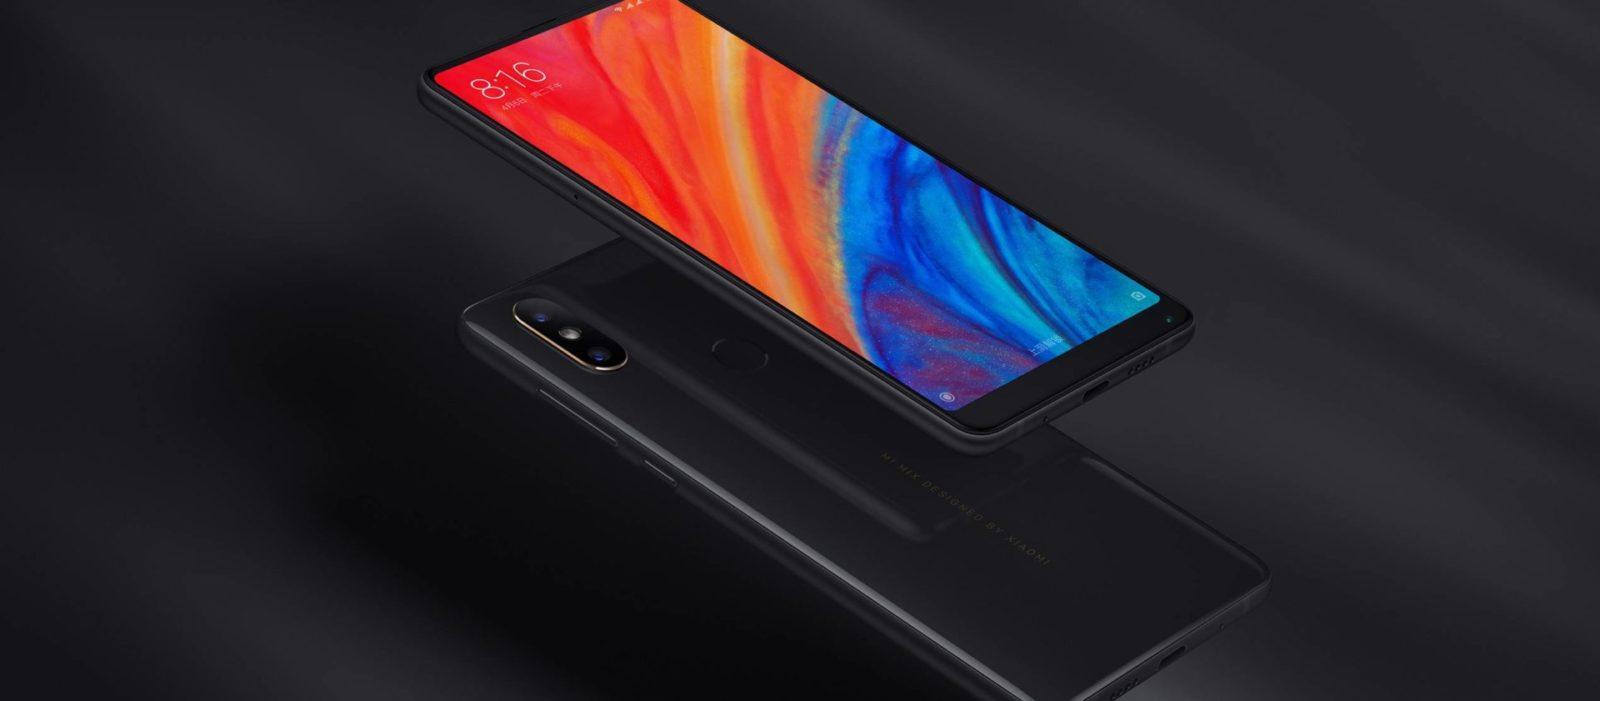 Android P per Xiaomi Mi Mix 2S spunta in rete